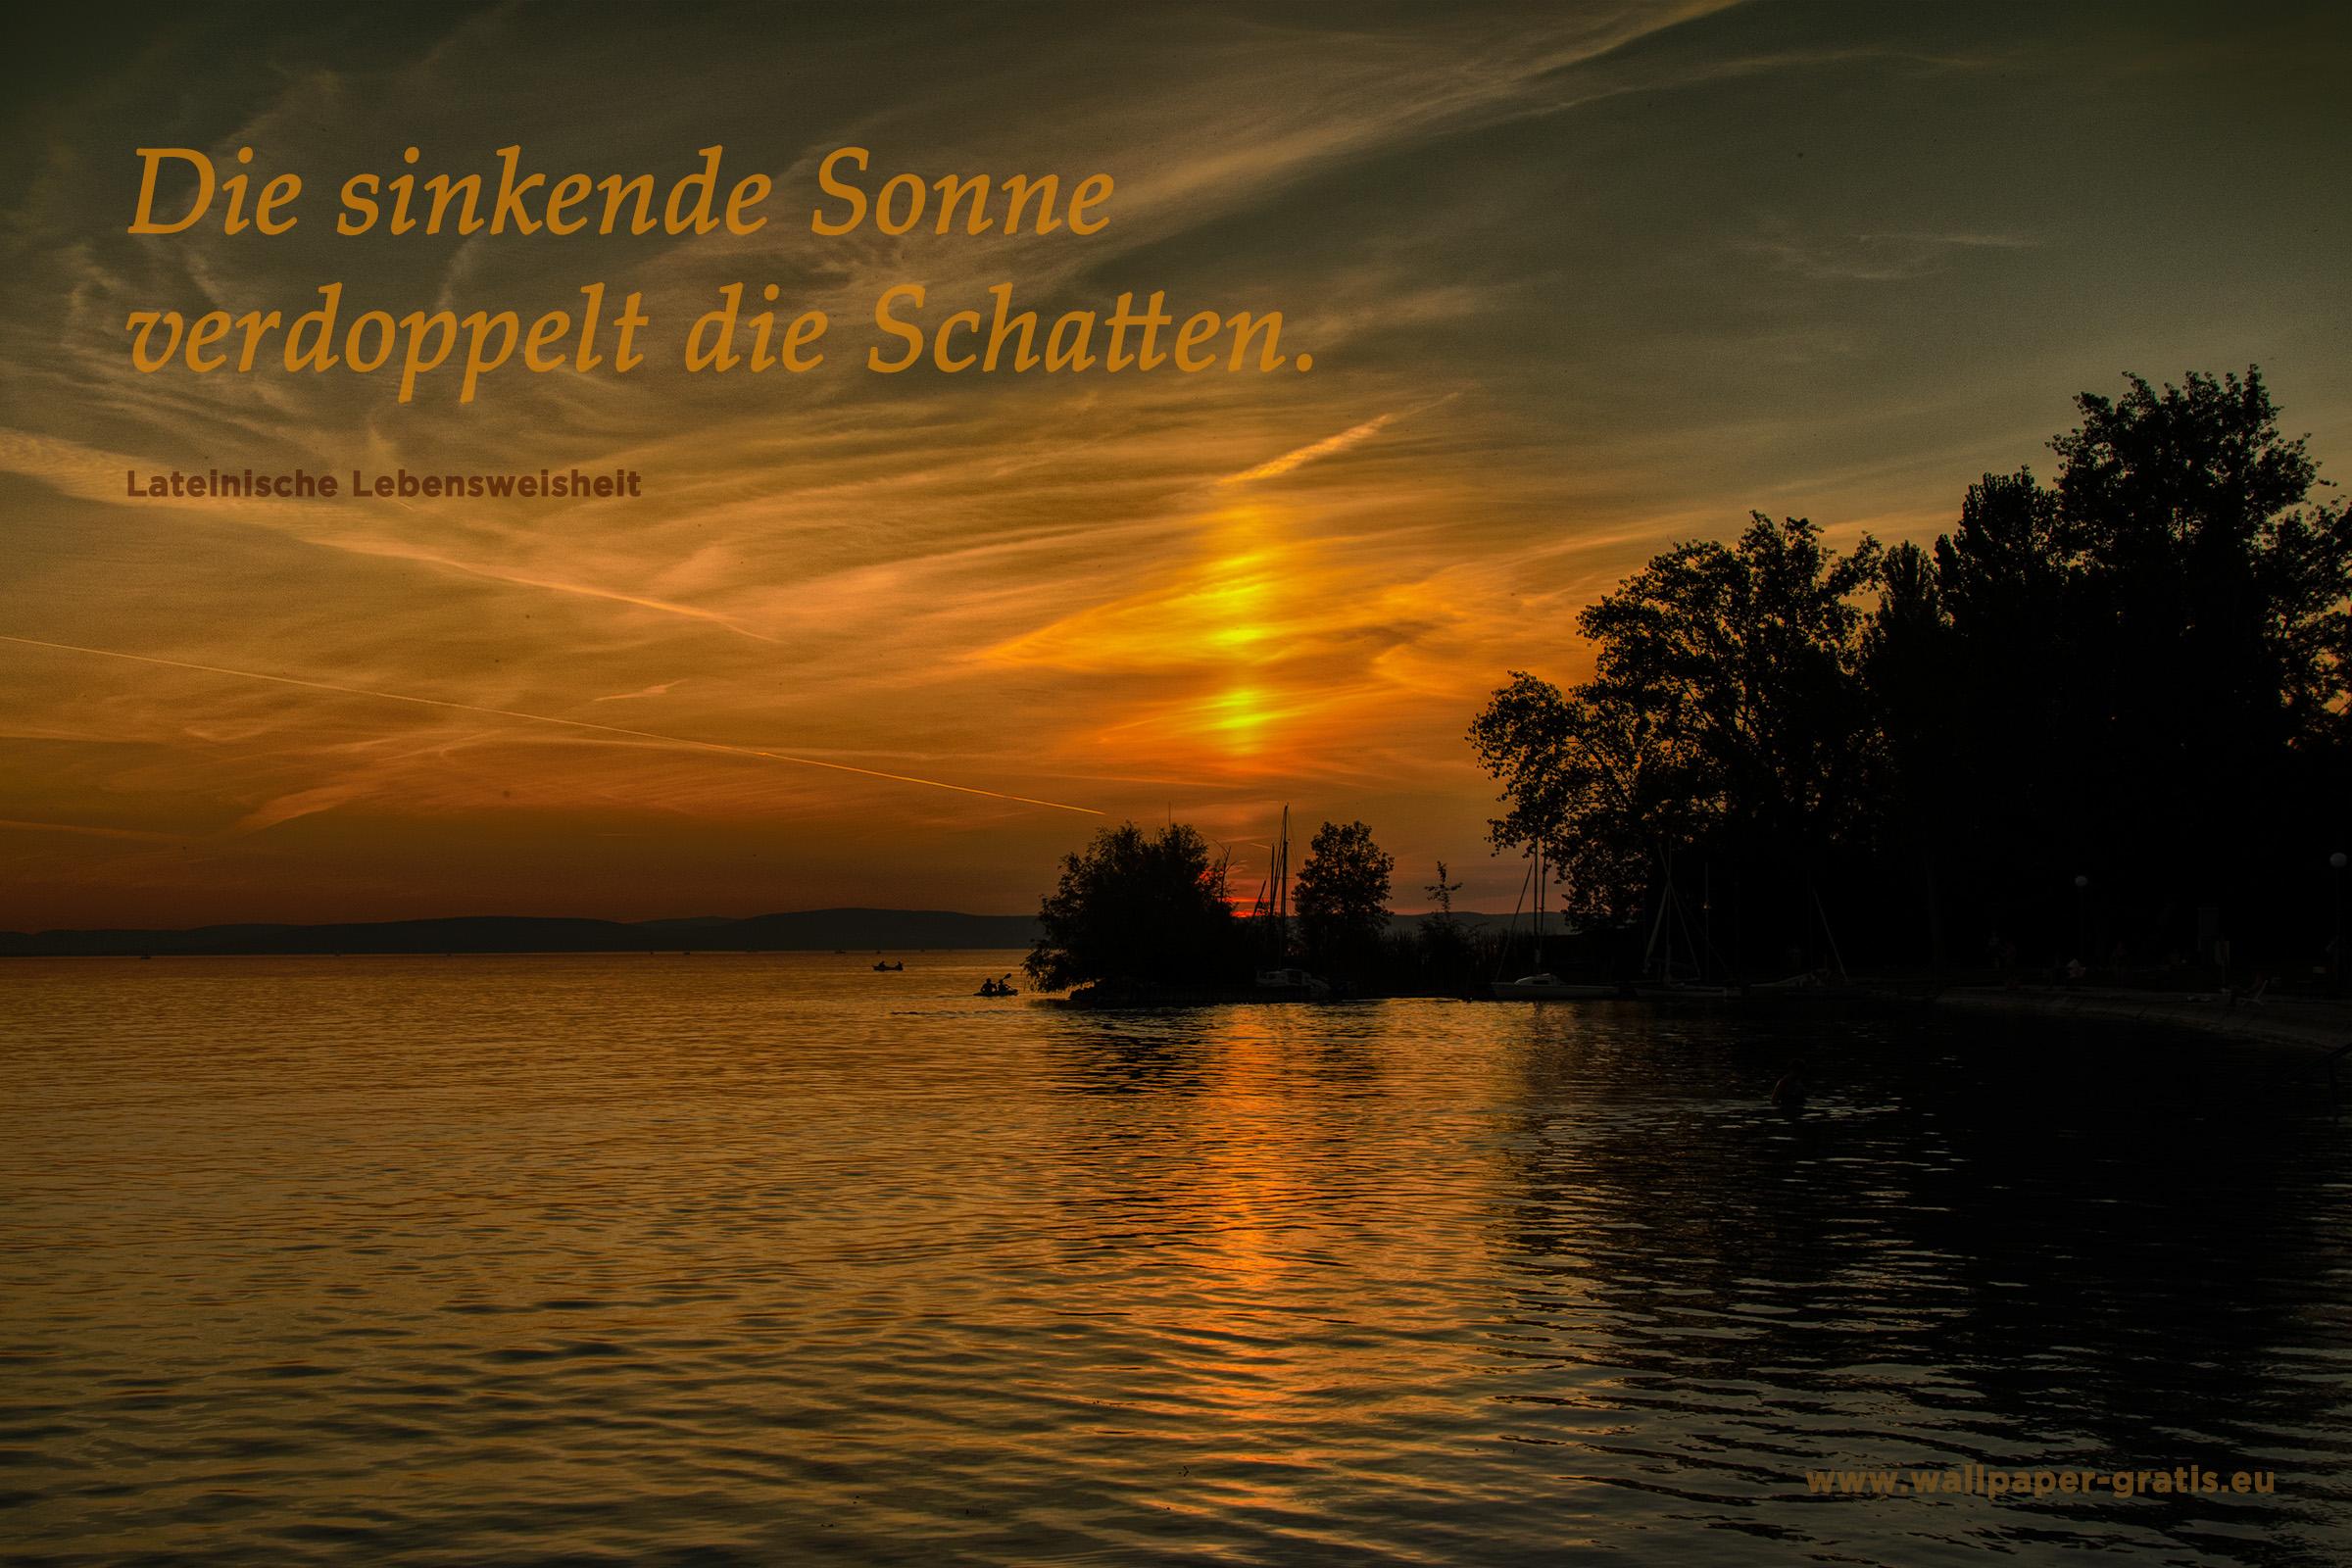 Zitat - Sonnenuntergang 002 - Hintergrundbild